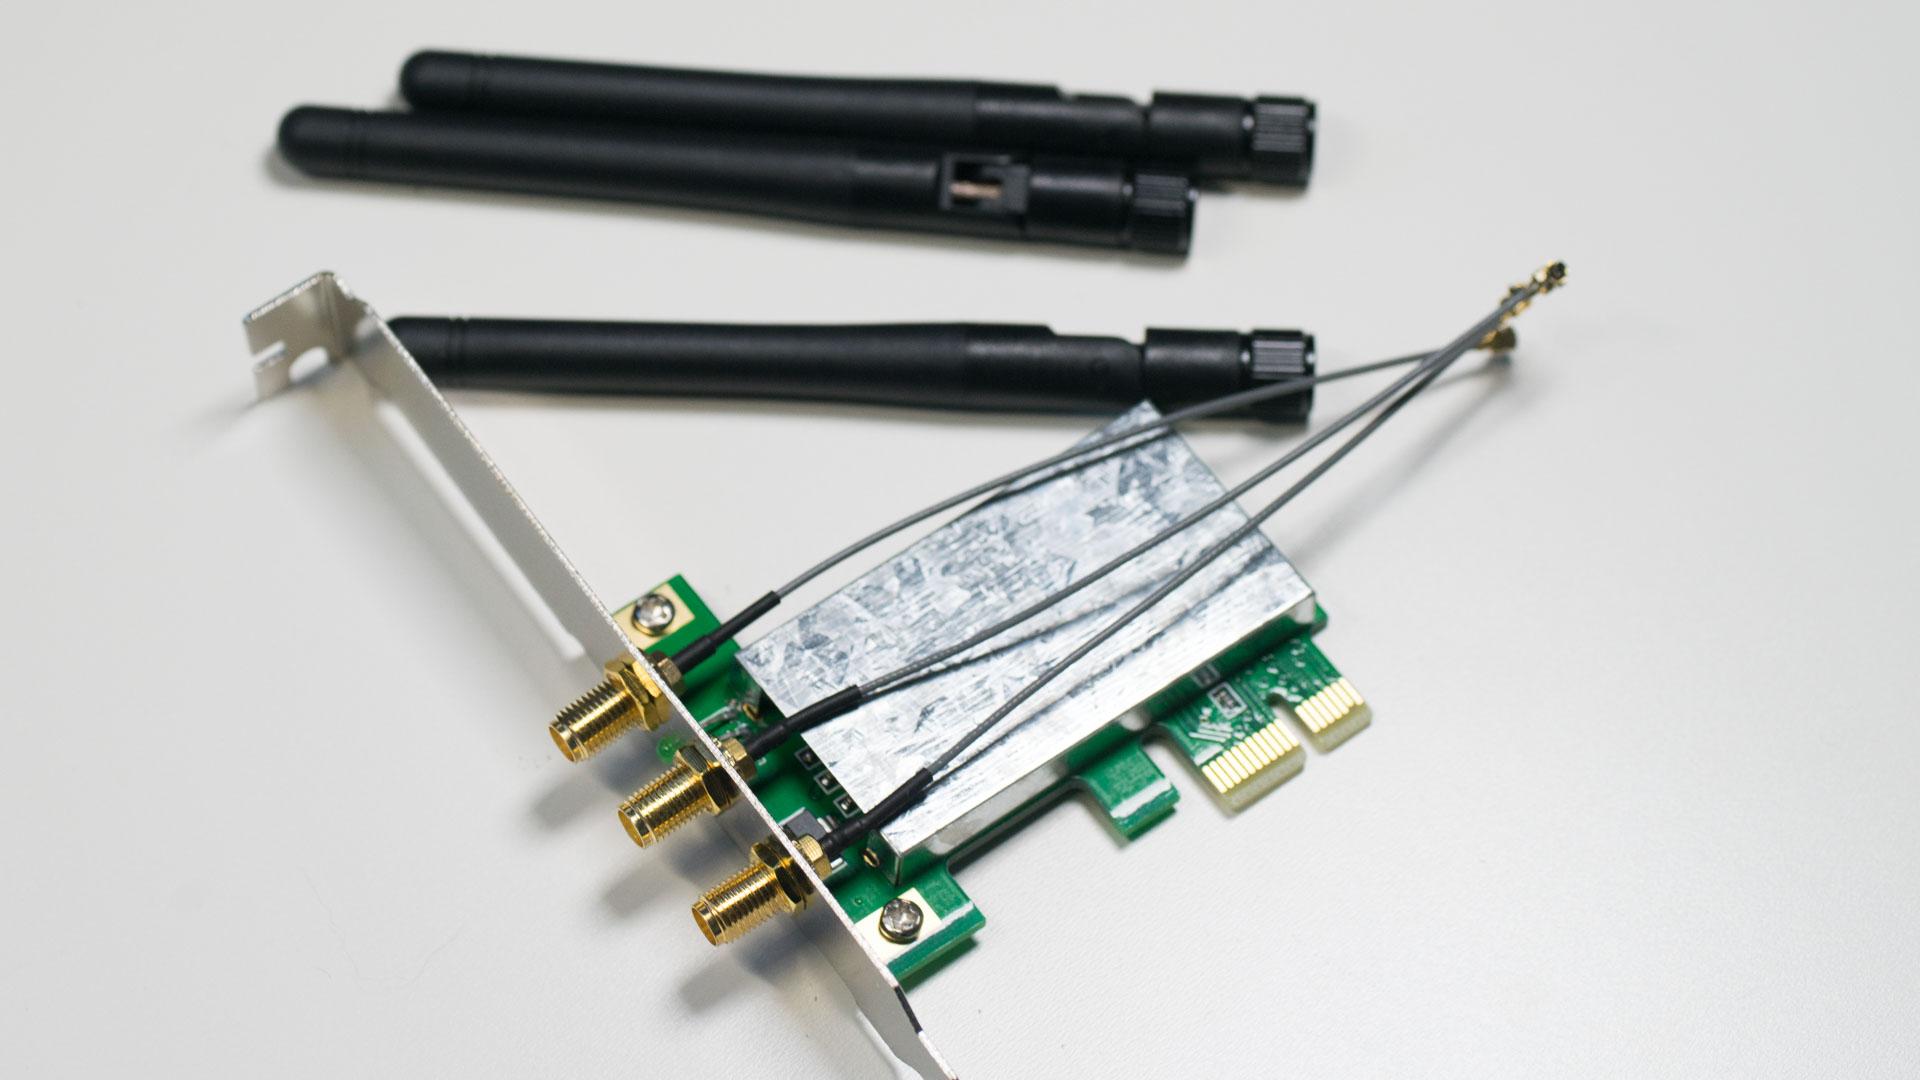 pcie mini card wlan adapter im desktop einsetzten pcie mini card auf pcie adapter techtest. Black Bedroom Furniture Sets. Home Design Ideas